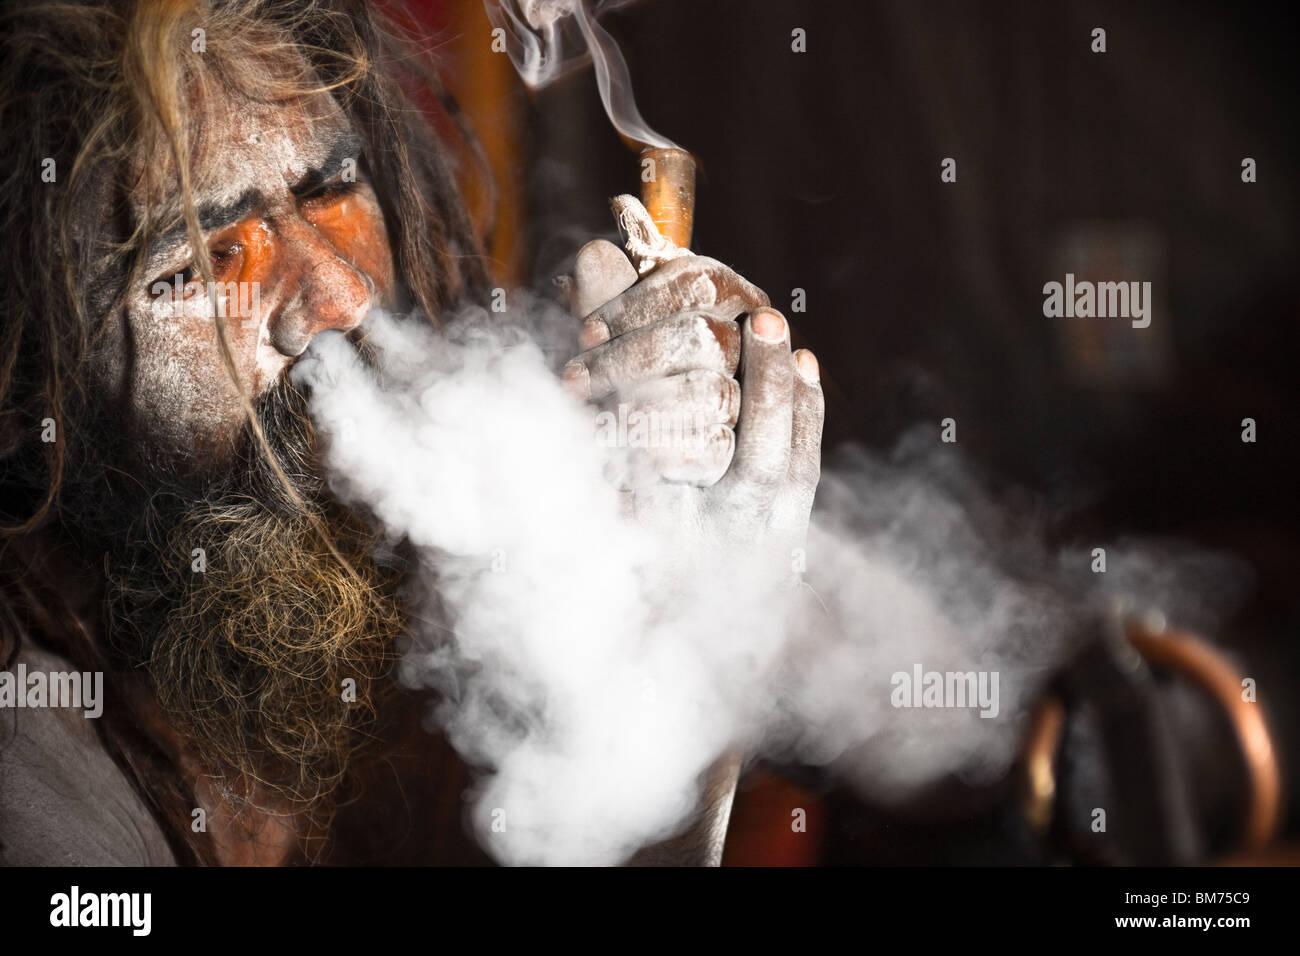 Au cours de la Naga sadus Kumbh Mela 2010 haridwar inde. Photo Stock